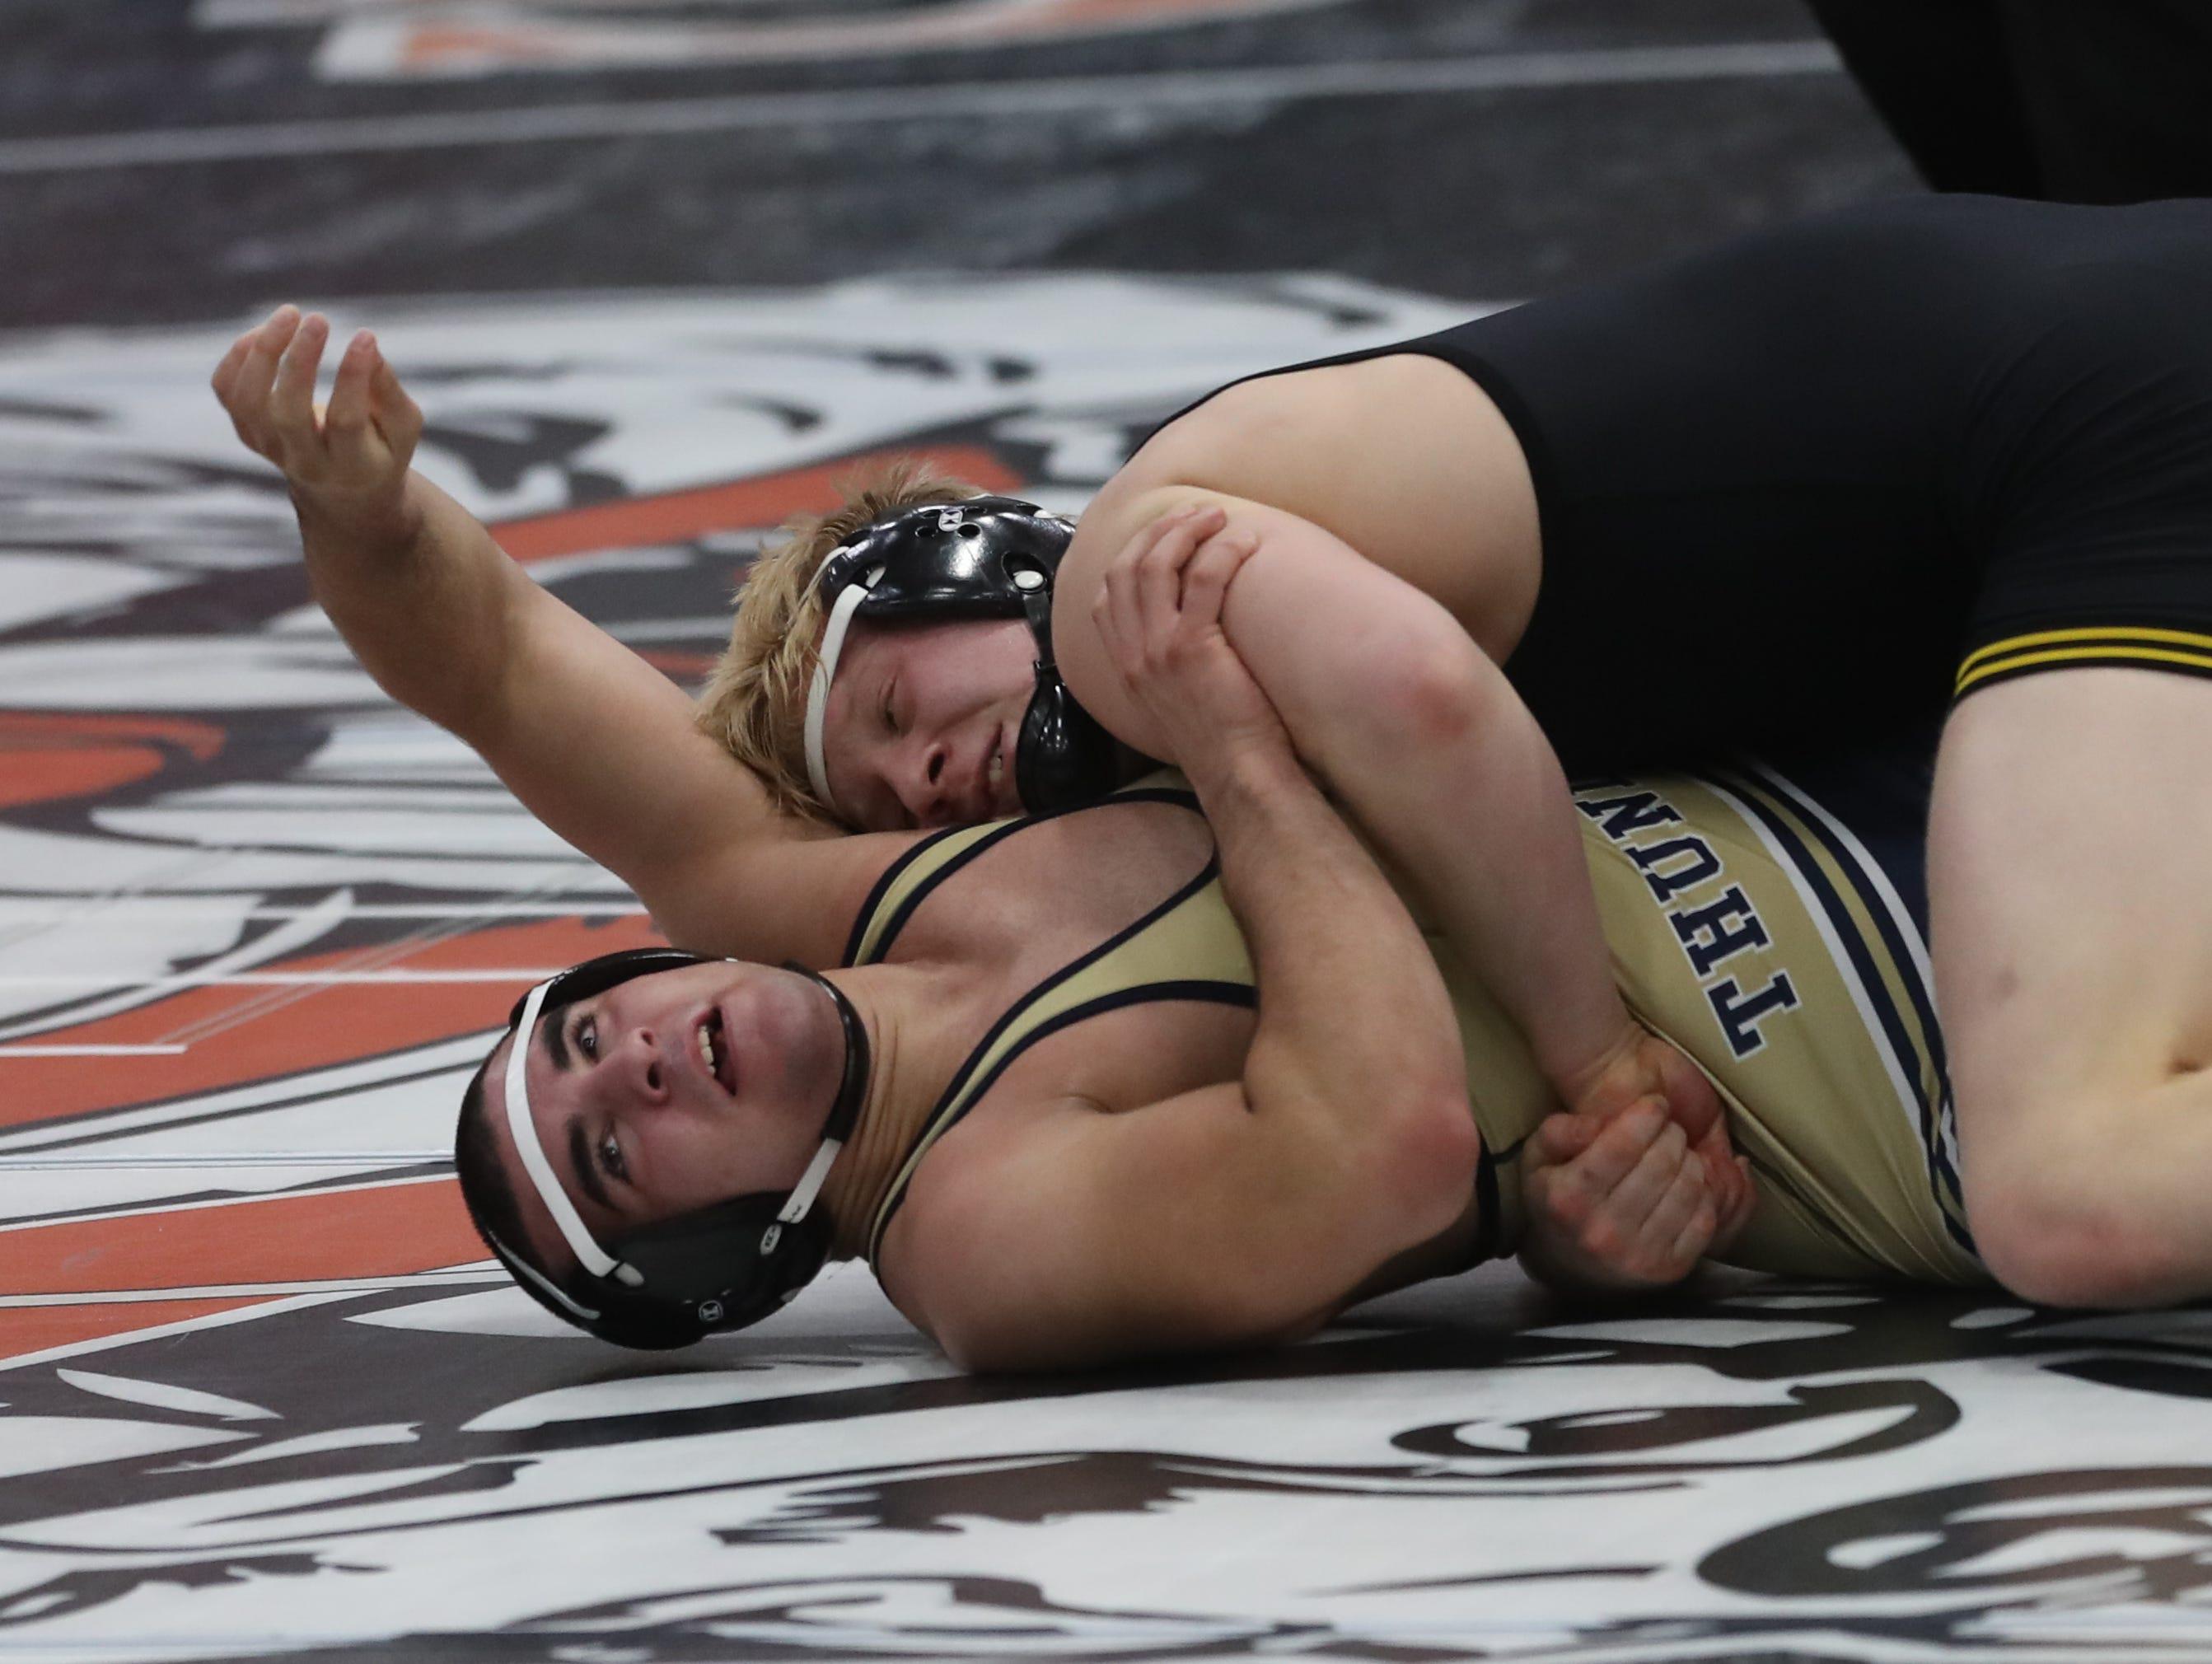 Gabe Christenson, of Southeast Polk High, wrestles at the Cheesehead Invitational at Kaukauna High School in Kaukauna, Wisconsin, on Jan. 5, 2019.